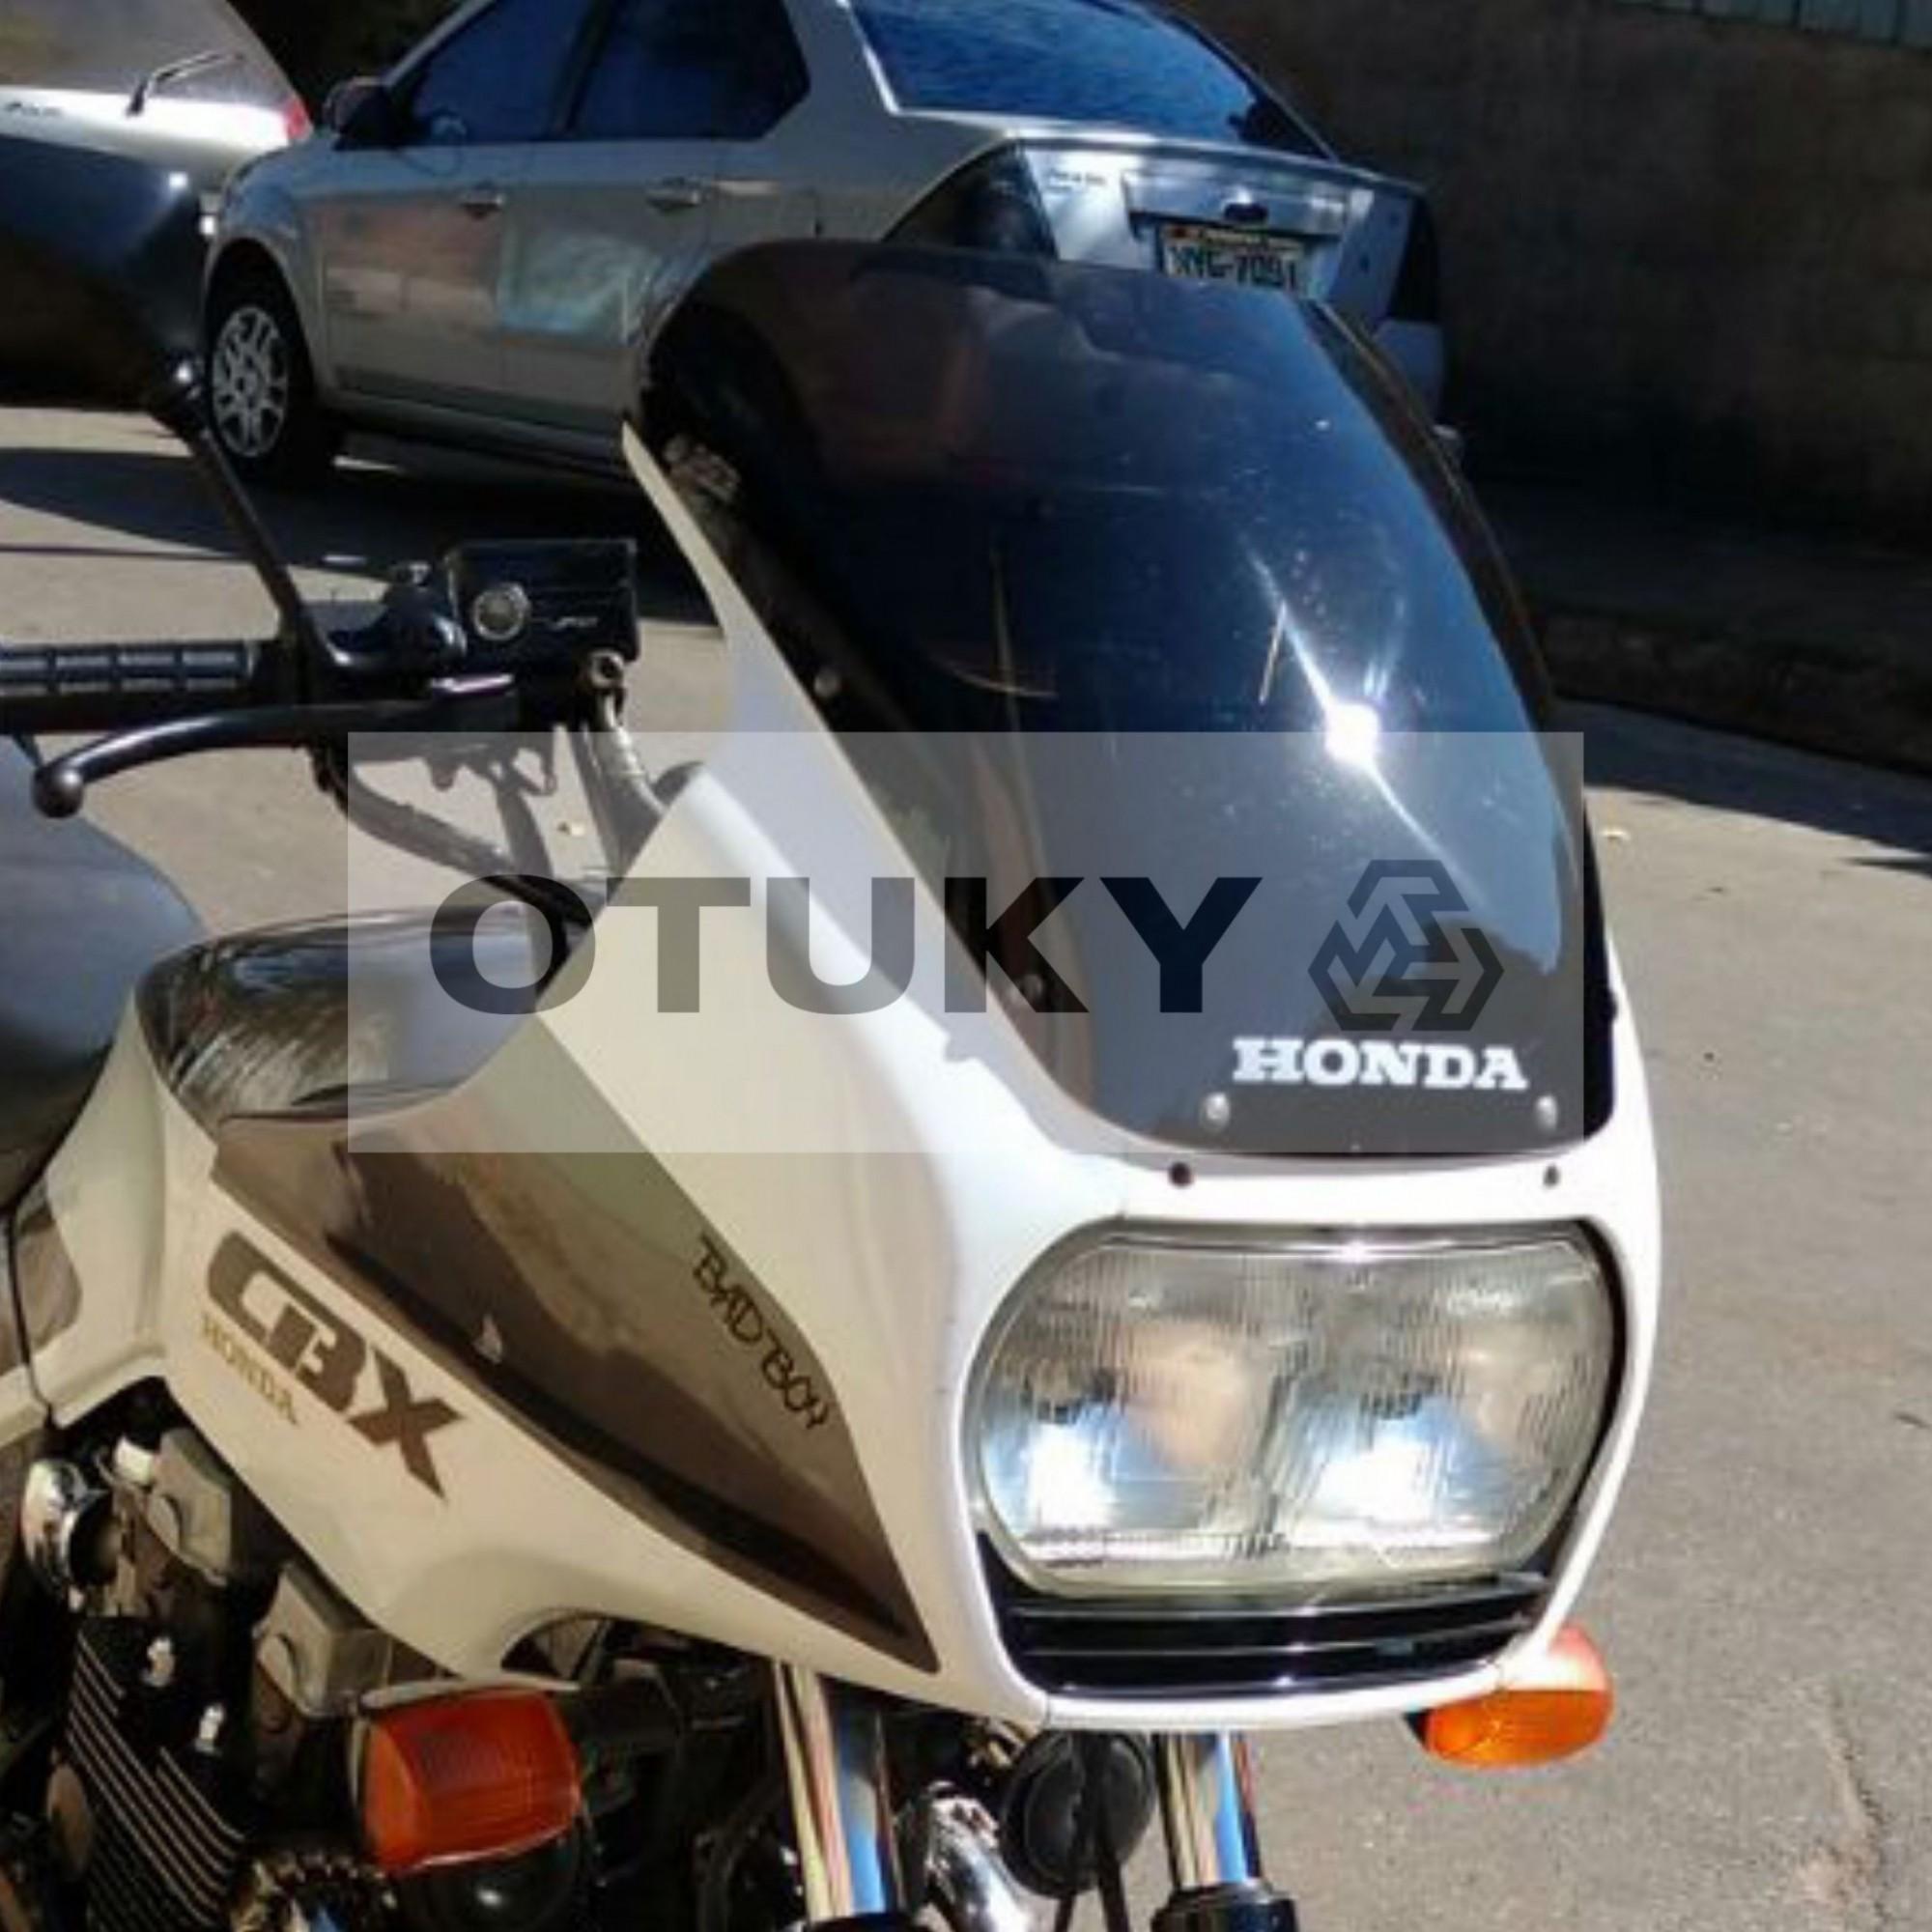 Bolha para Moto CBX 750 Galo 1987 1988 1989 1990 Otuky Padrão